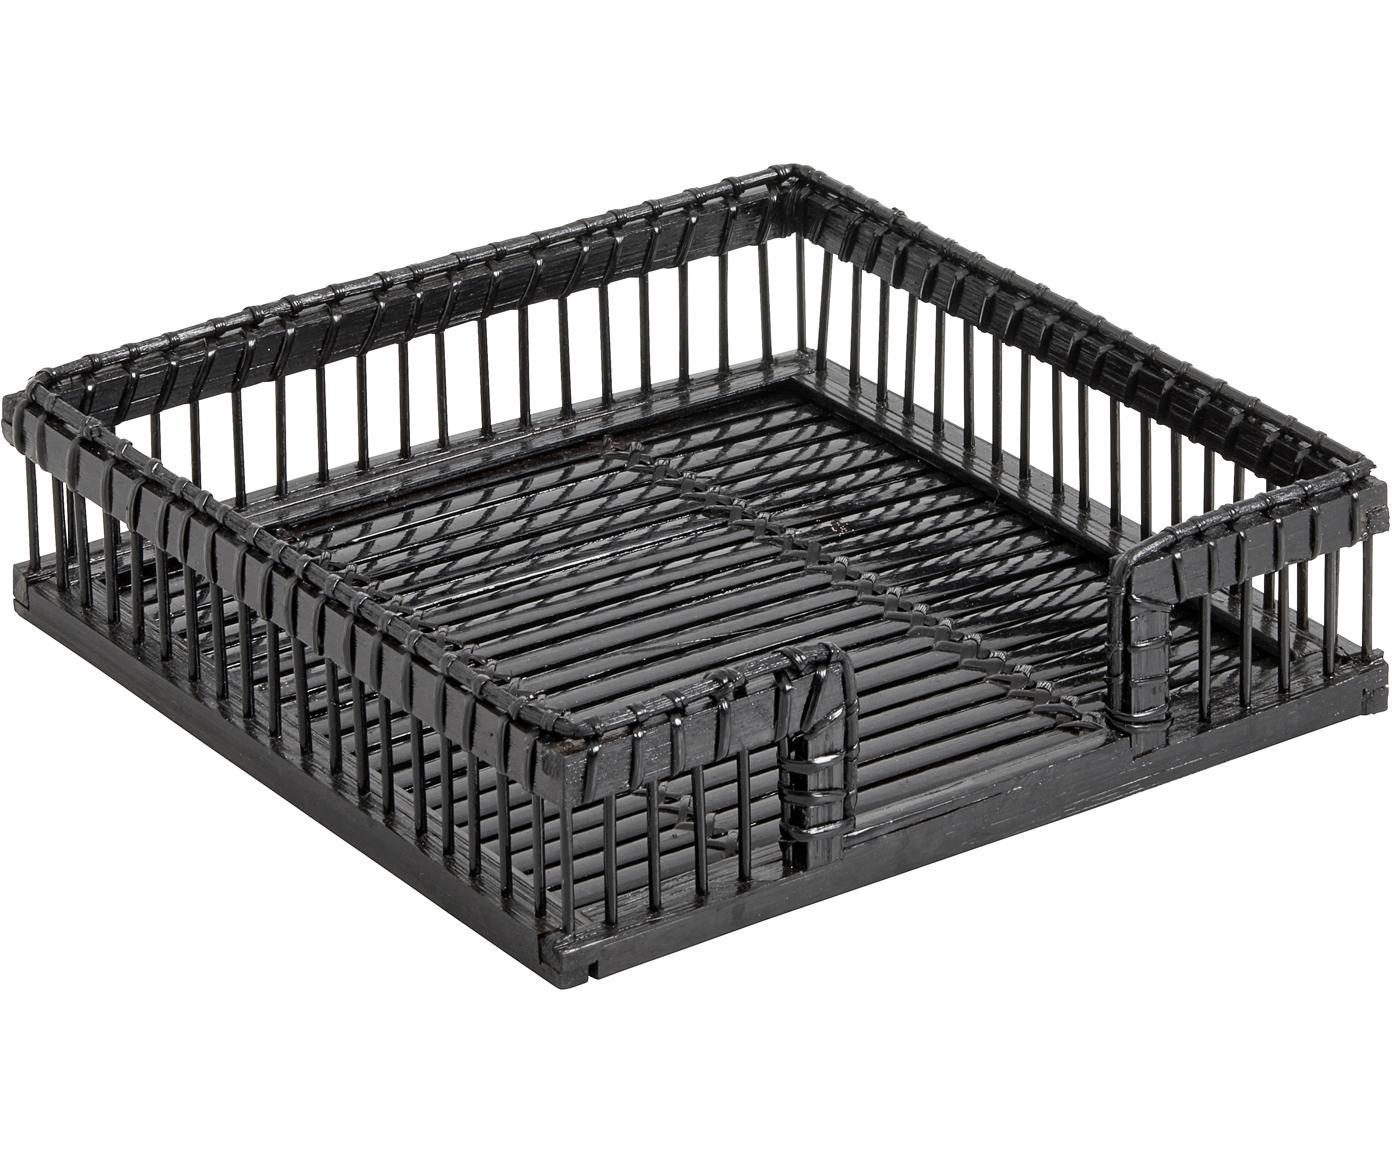 Bamboe servettenhouder Bila in zwart, Bamboehout, Zwart, B 19 x D 19 cm